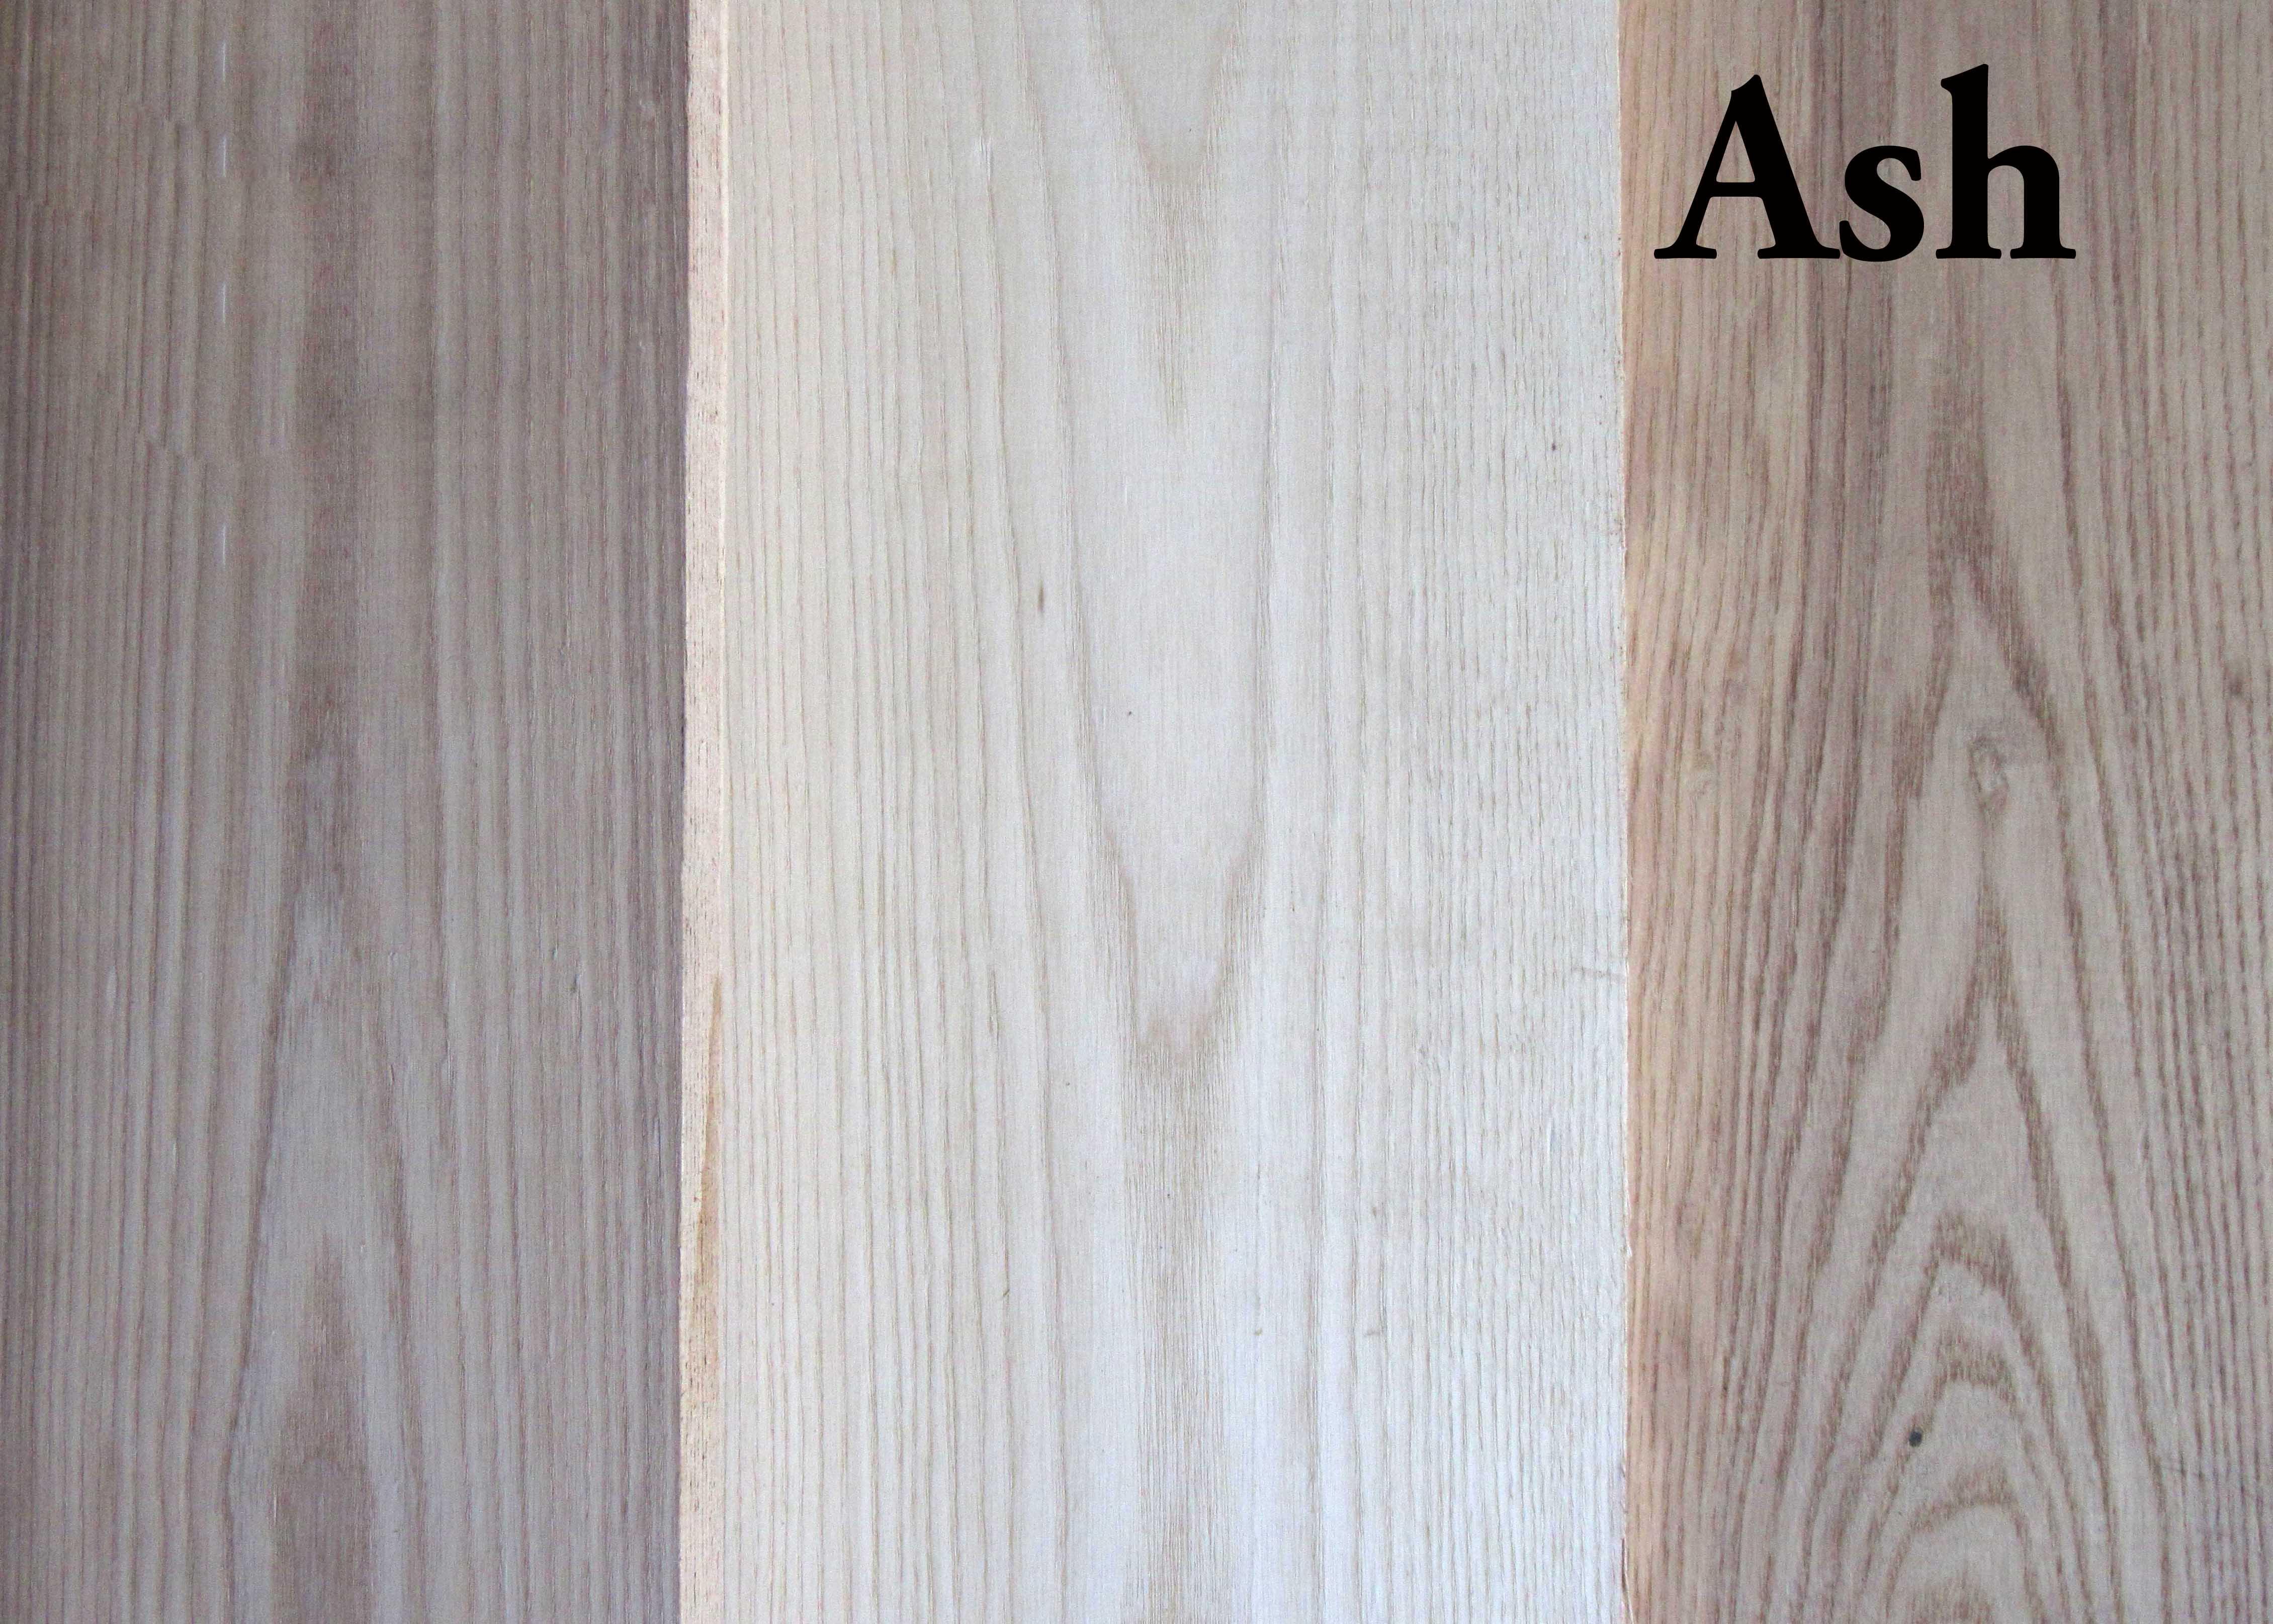 Ash Hardwood S2s Capitol City Lumber